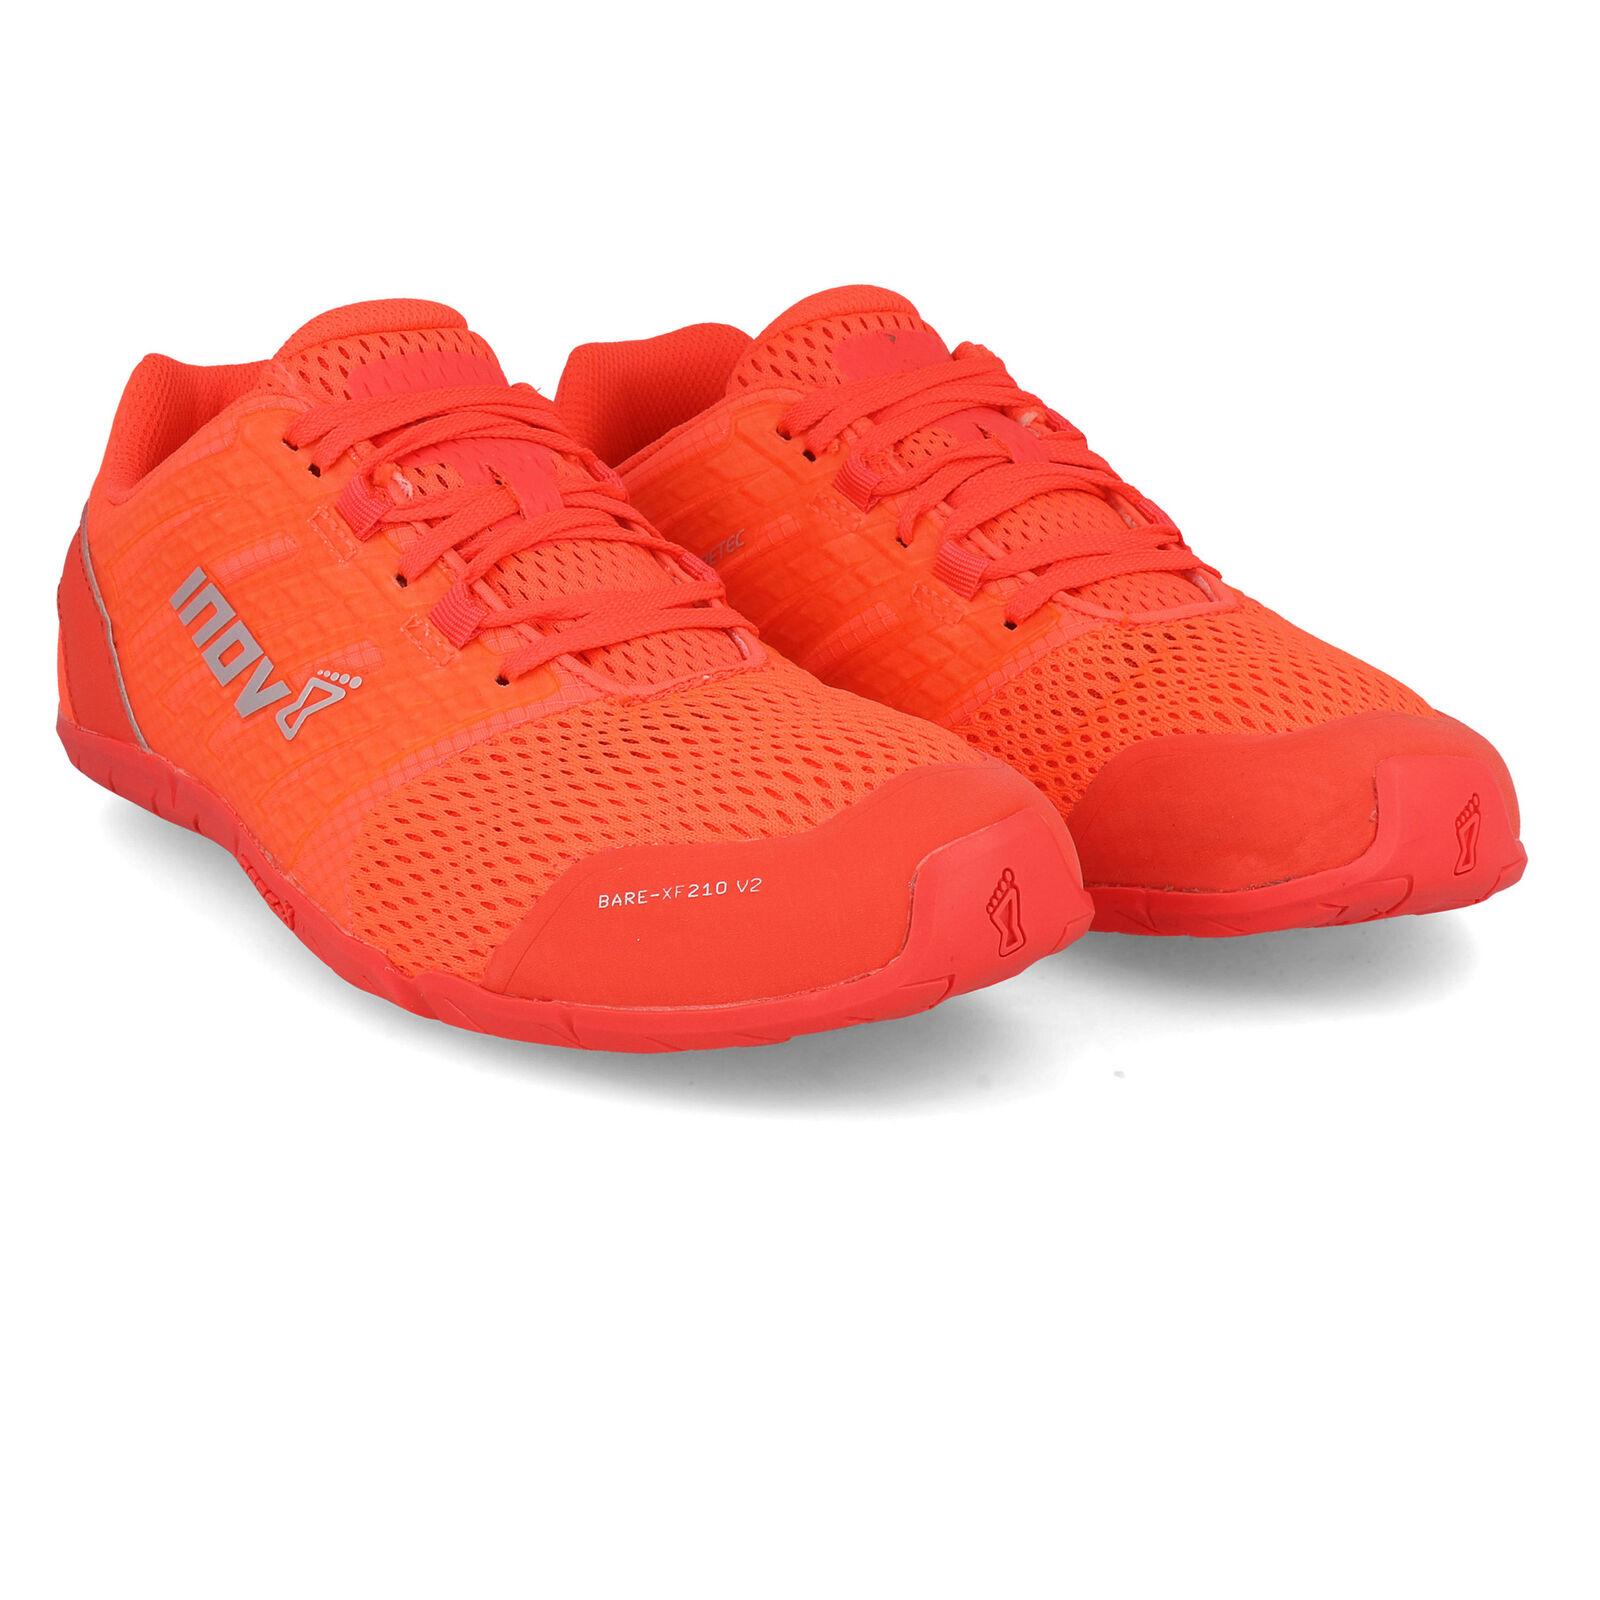 Inov8 Damen Bare XF 210 V2 Trainingsschuhe Fitness Sport Schuhe Turnschuhe Orange